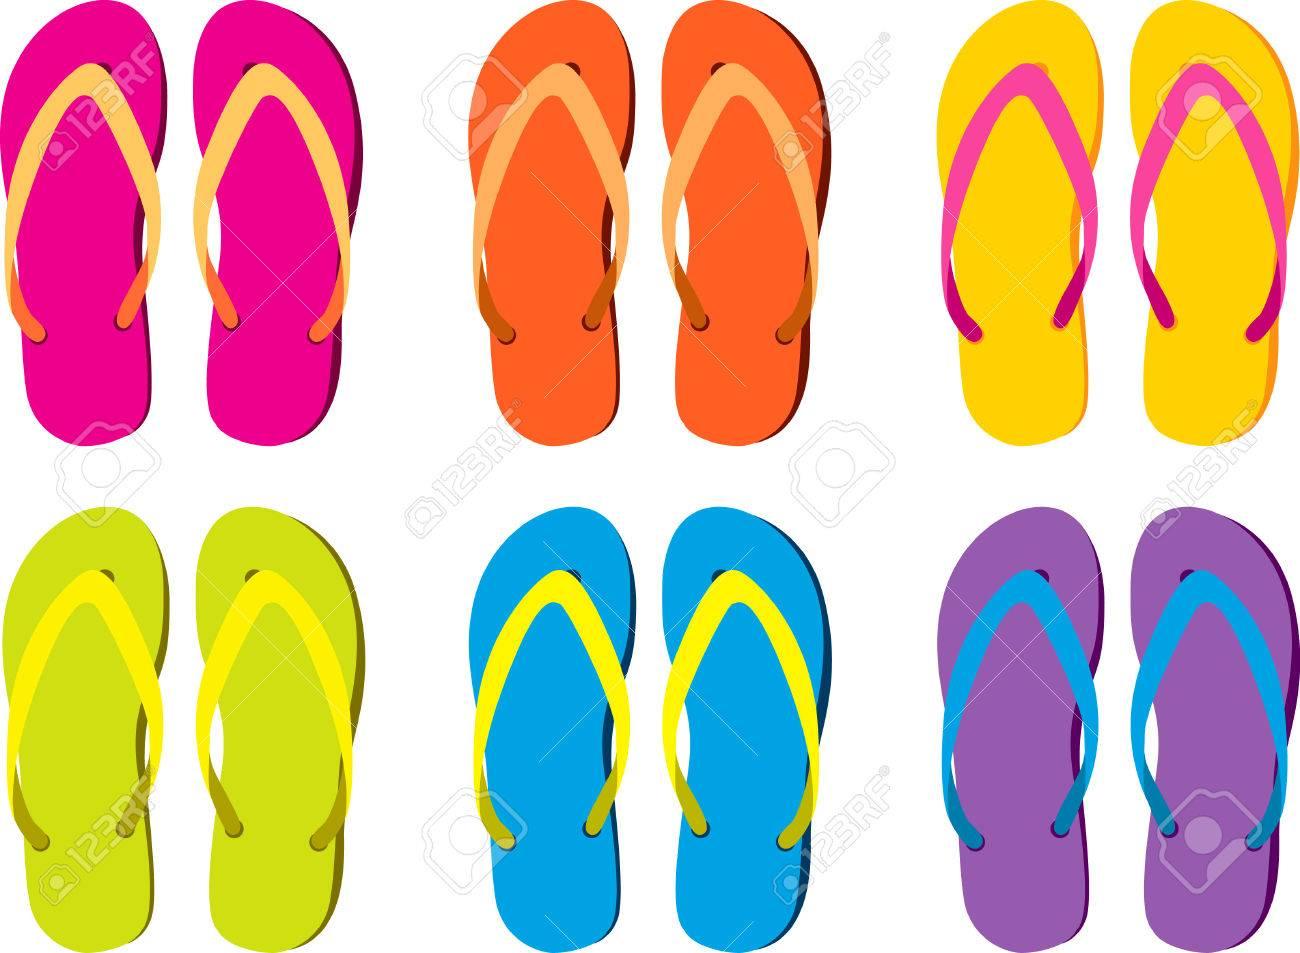 de16b7550c4 six pairs of colorful flip flops Stock Vector - 4063048